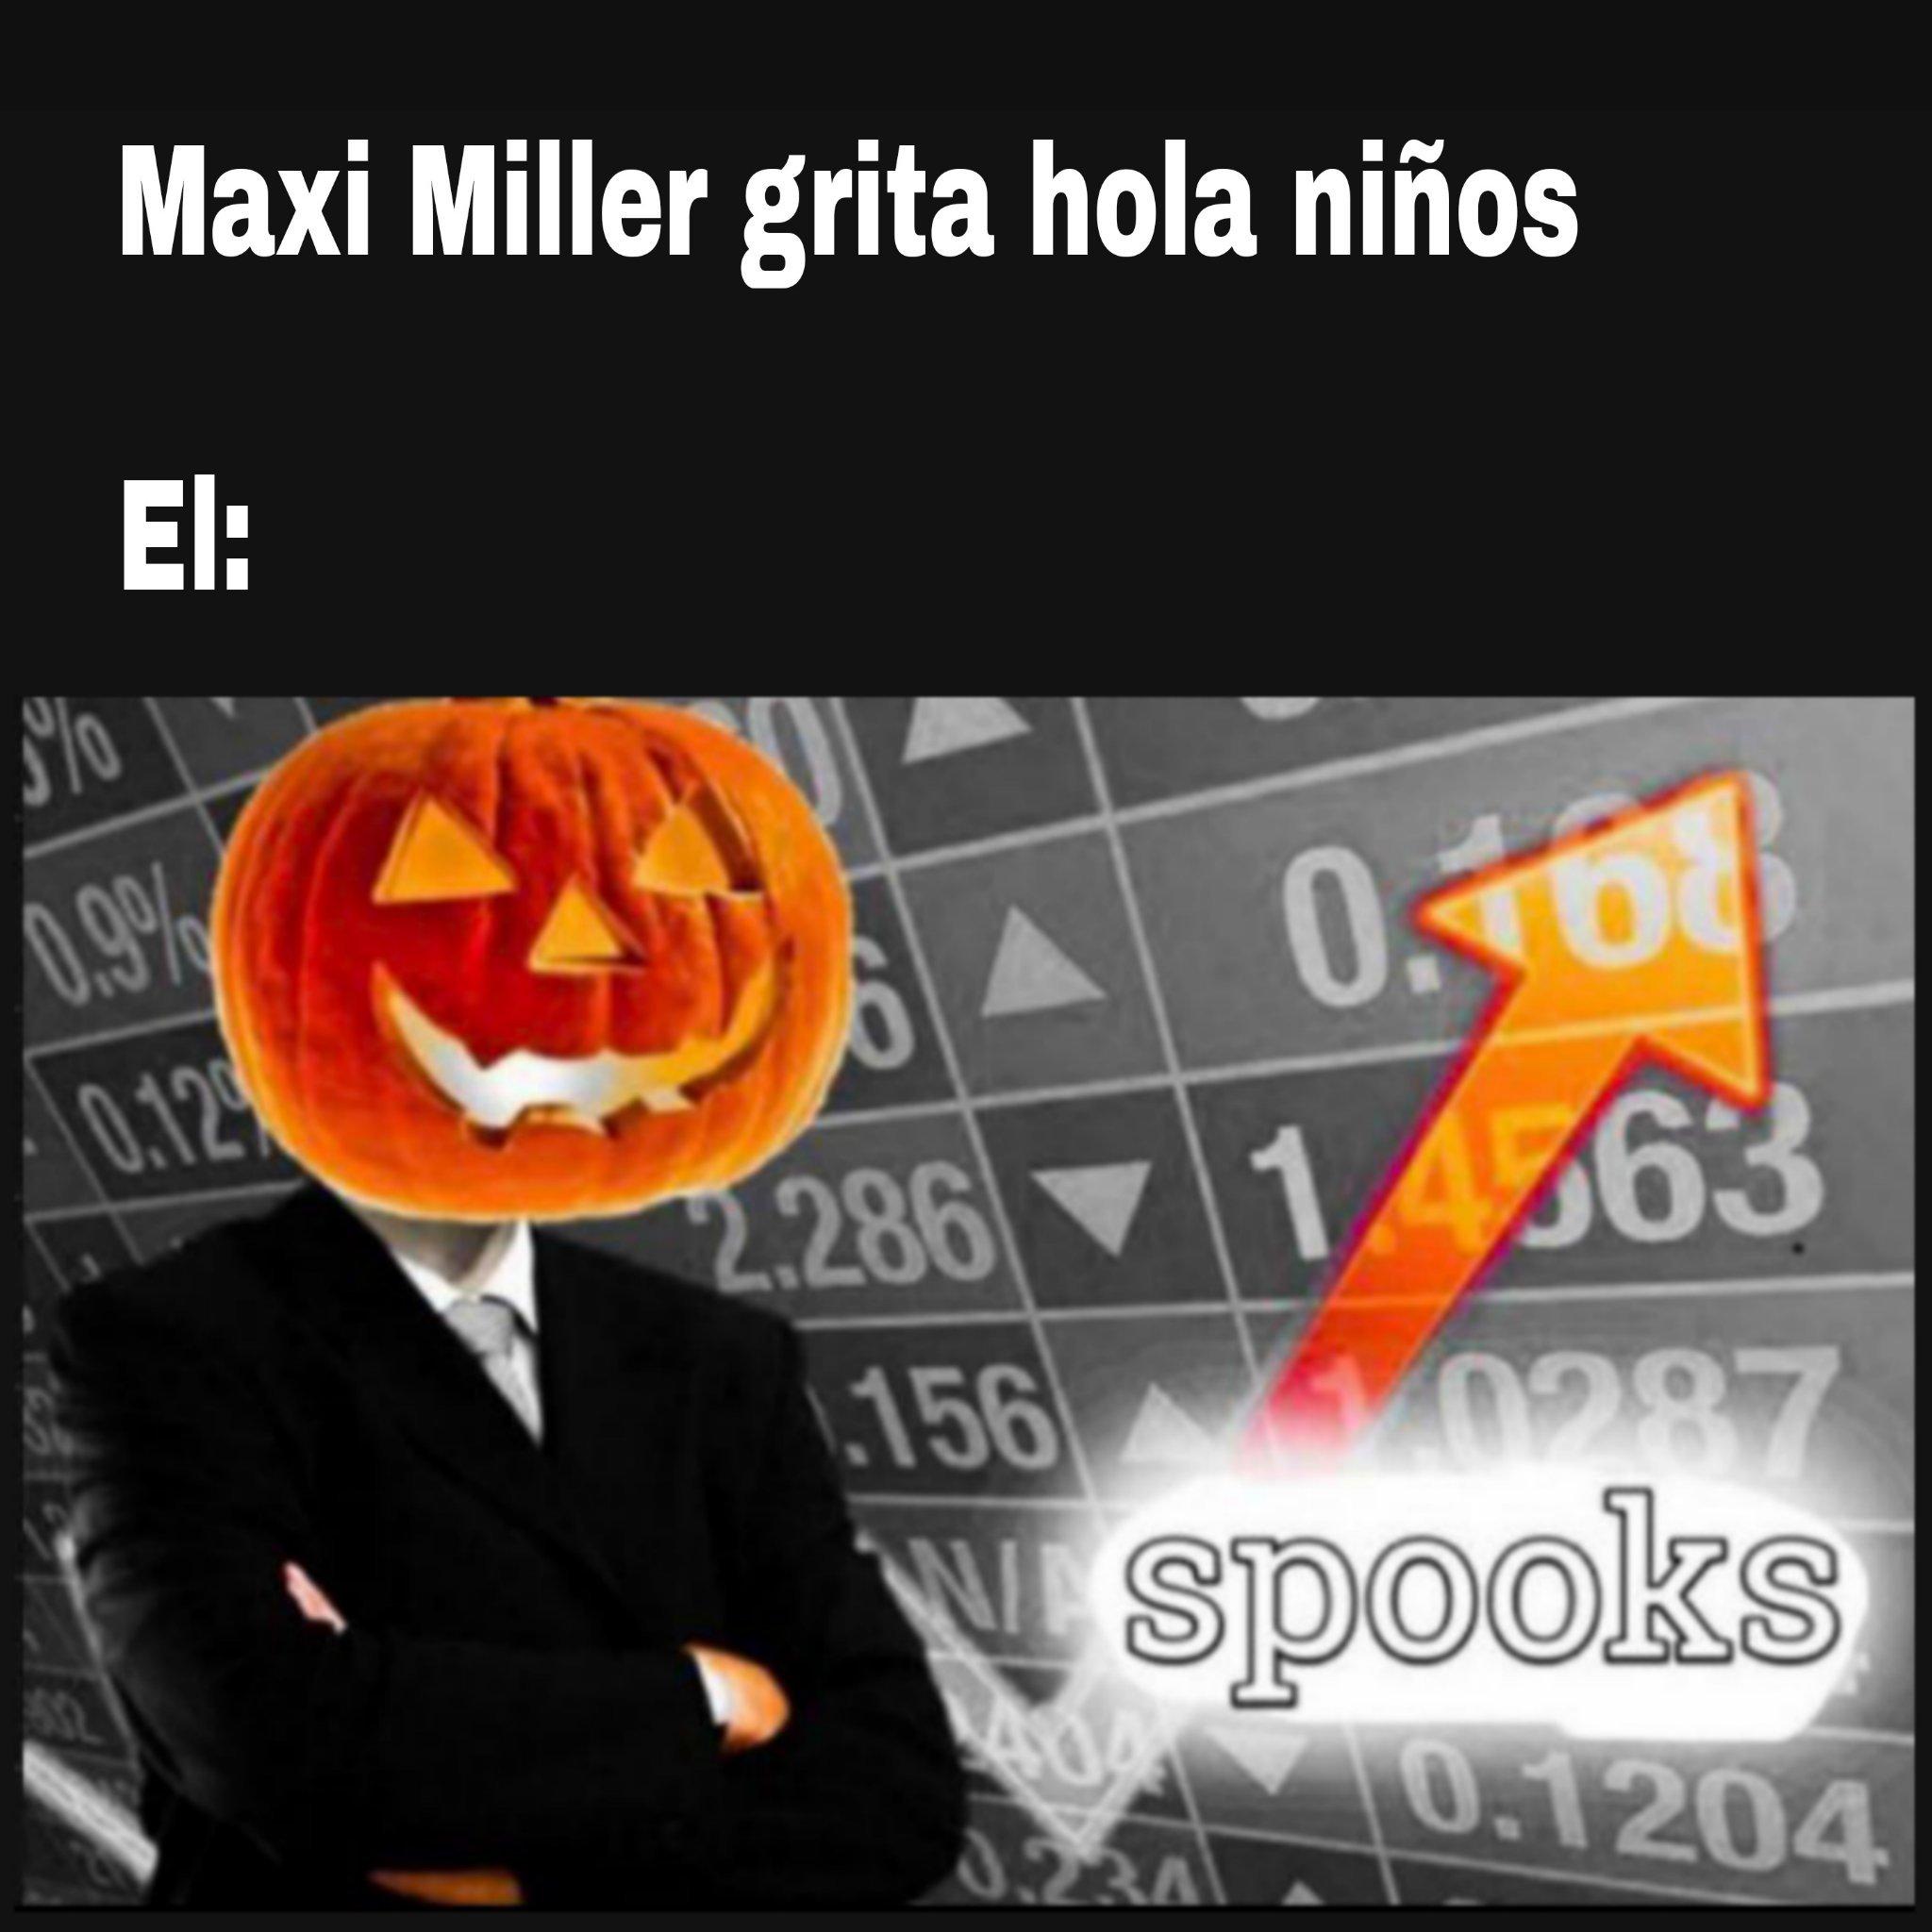 Maxi Miller - meme